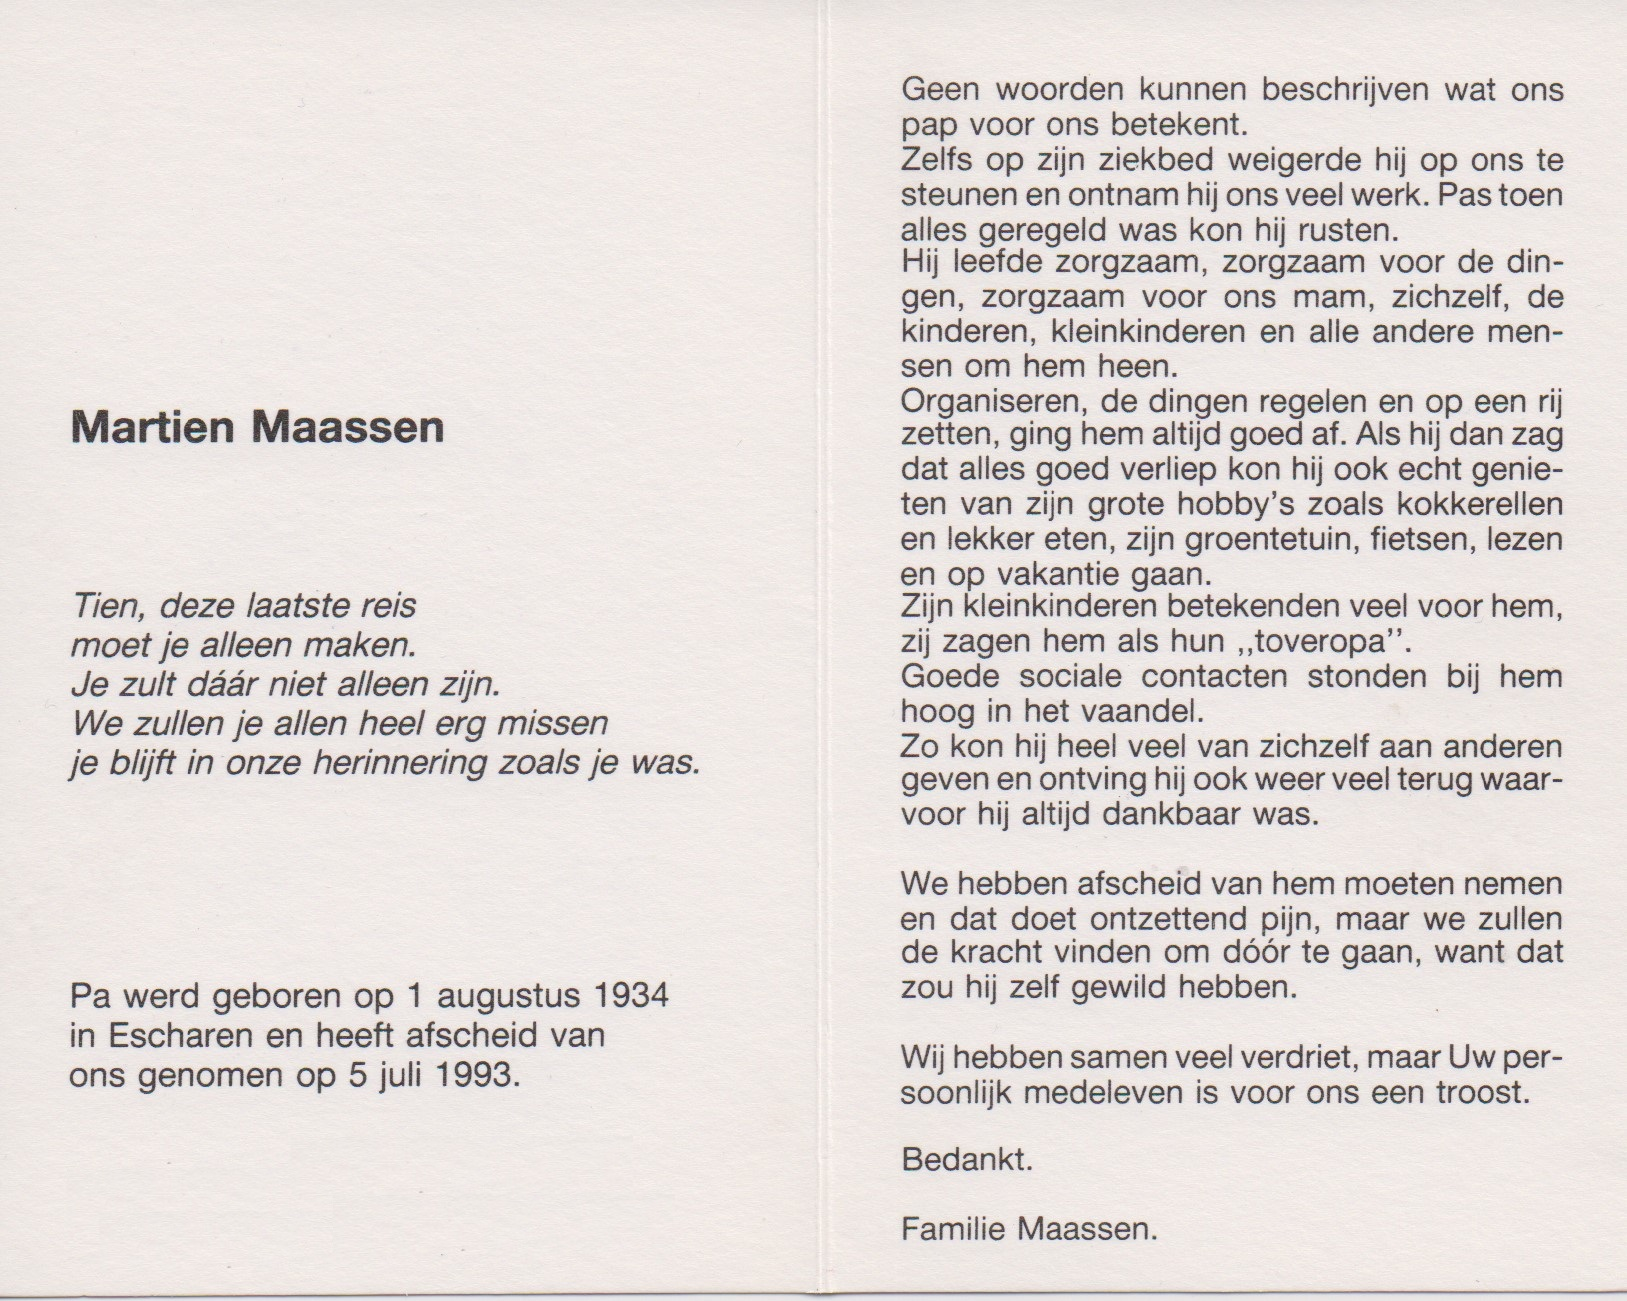 Bidprentje MartienMaassen